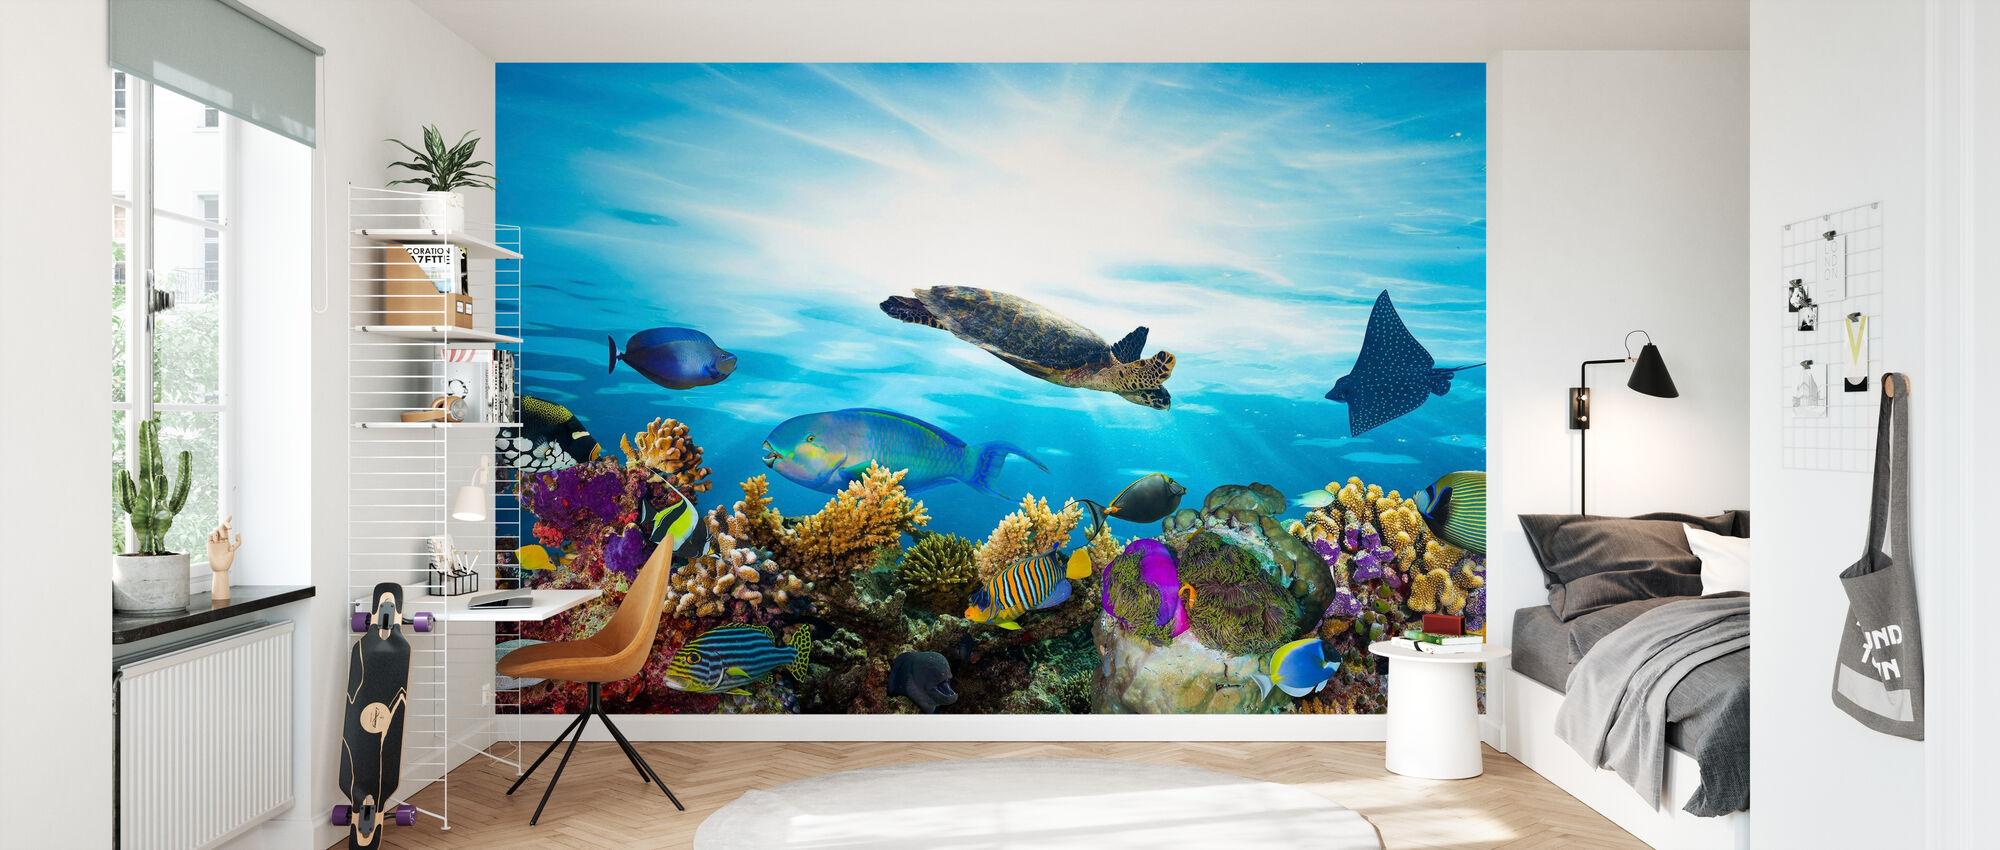 Coral Reef Panorama - Wallpaper - Kids Room